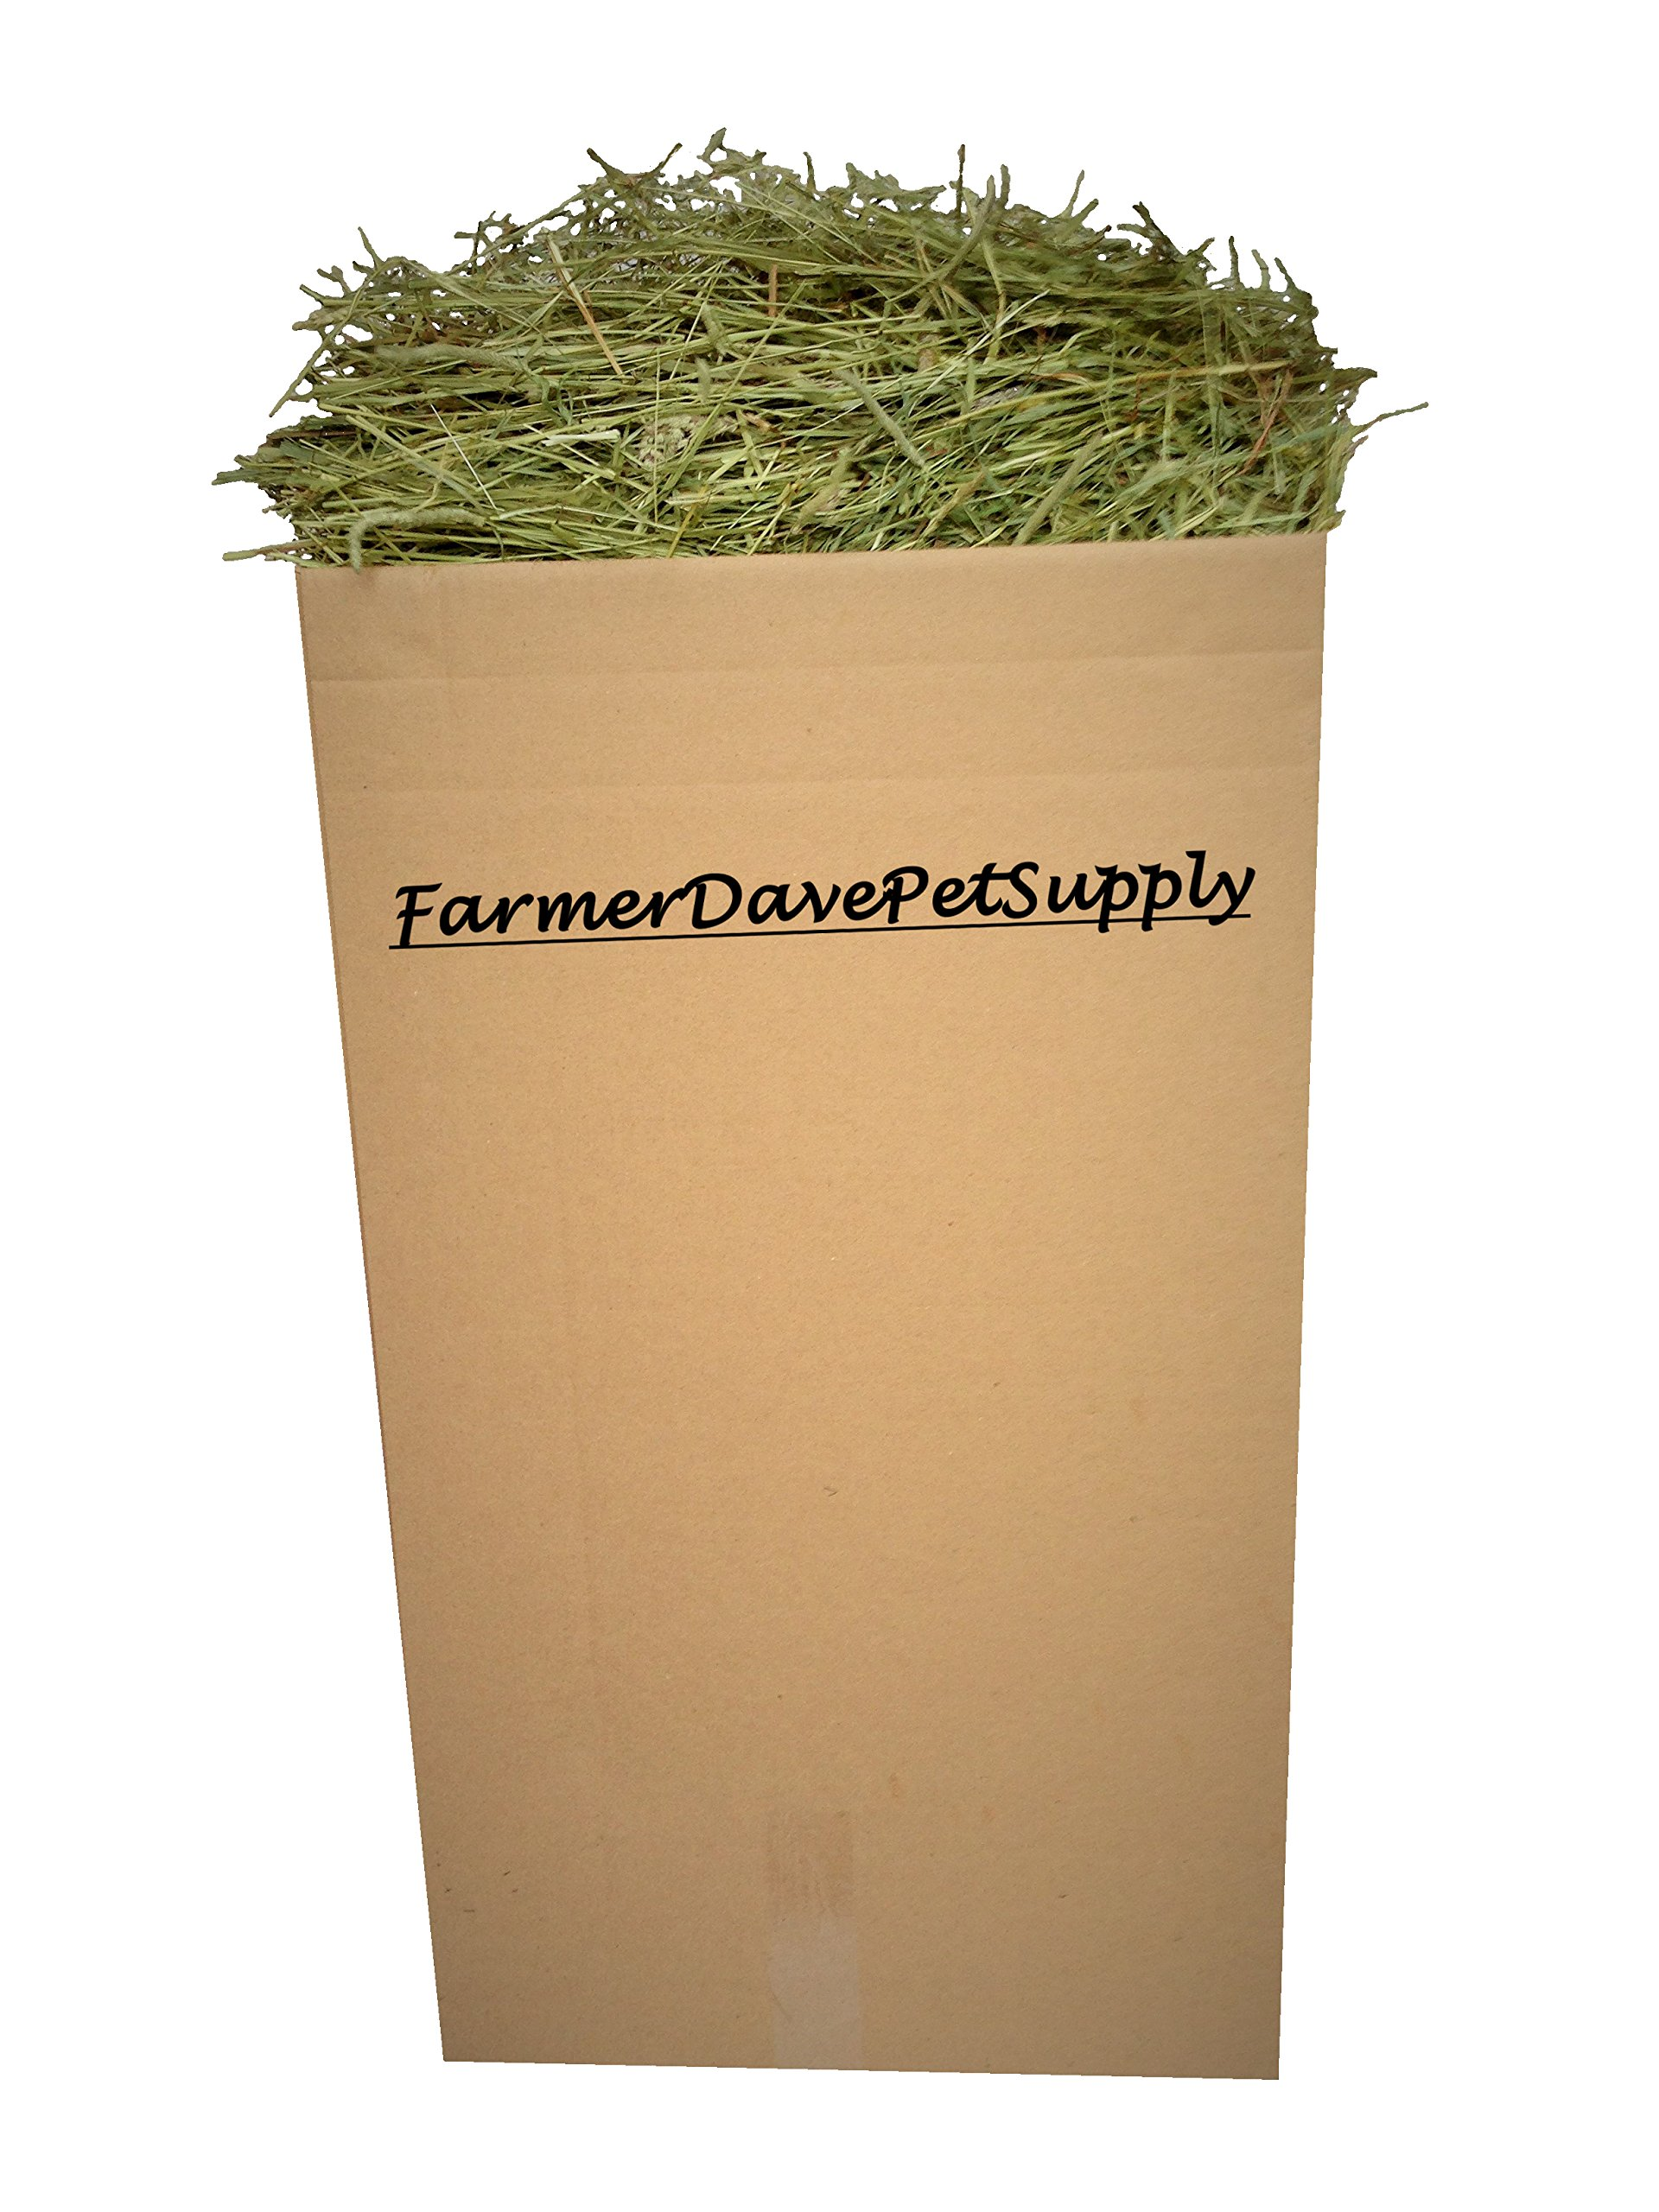 FarmerDavePetSupply 35 Lb First Cut Timothy Hay, Rabbit and Bunny Hay by FarmerDavePetSupply